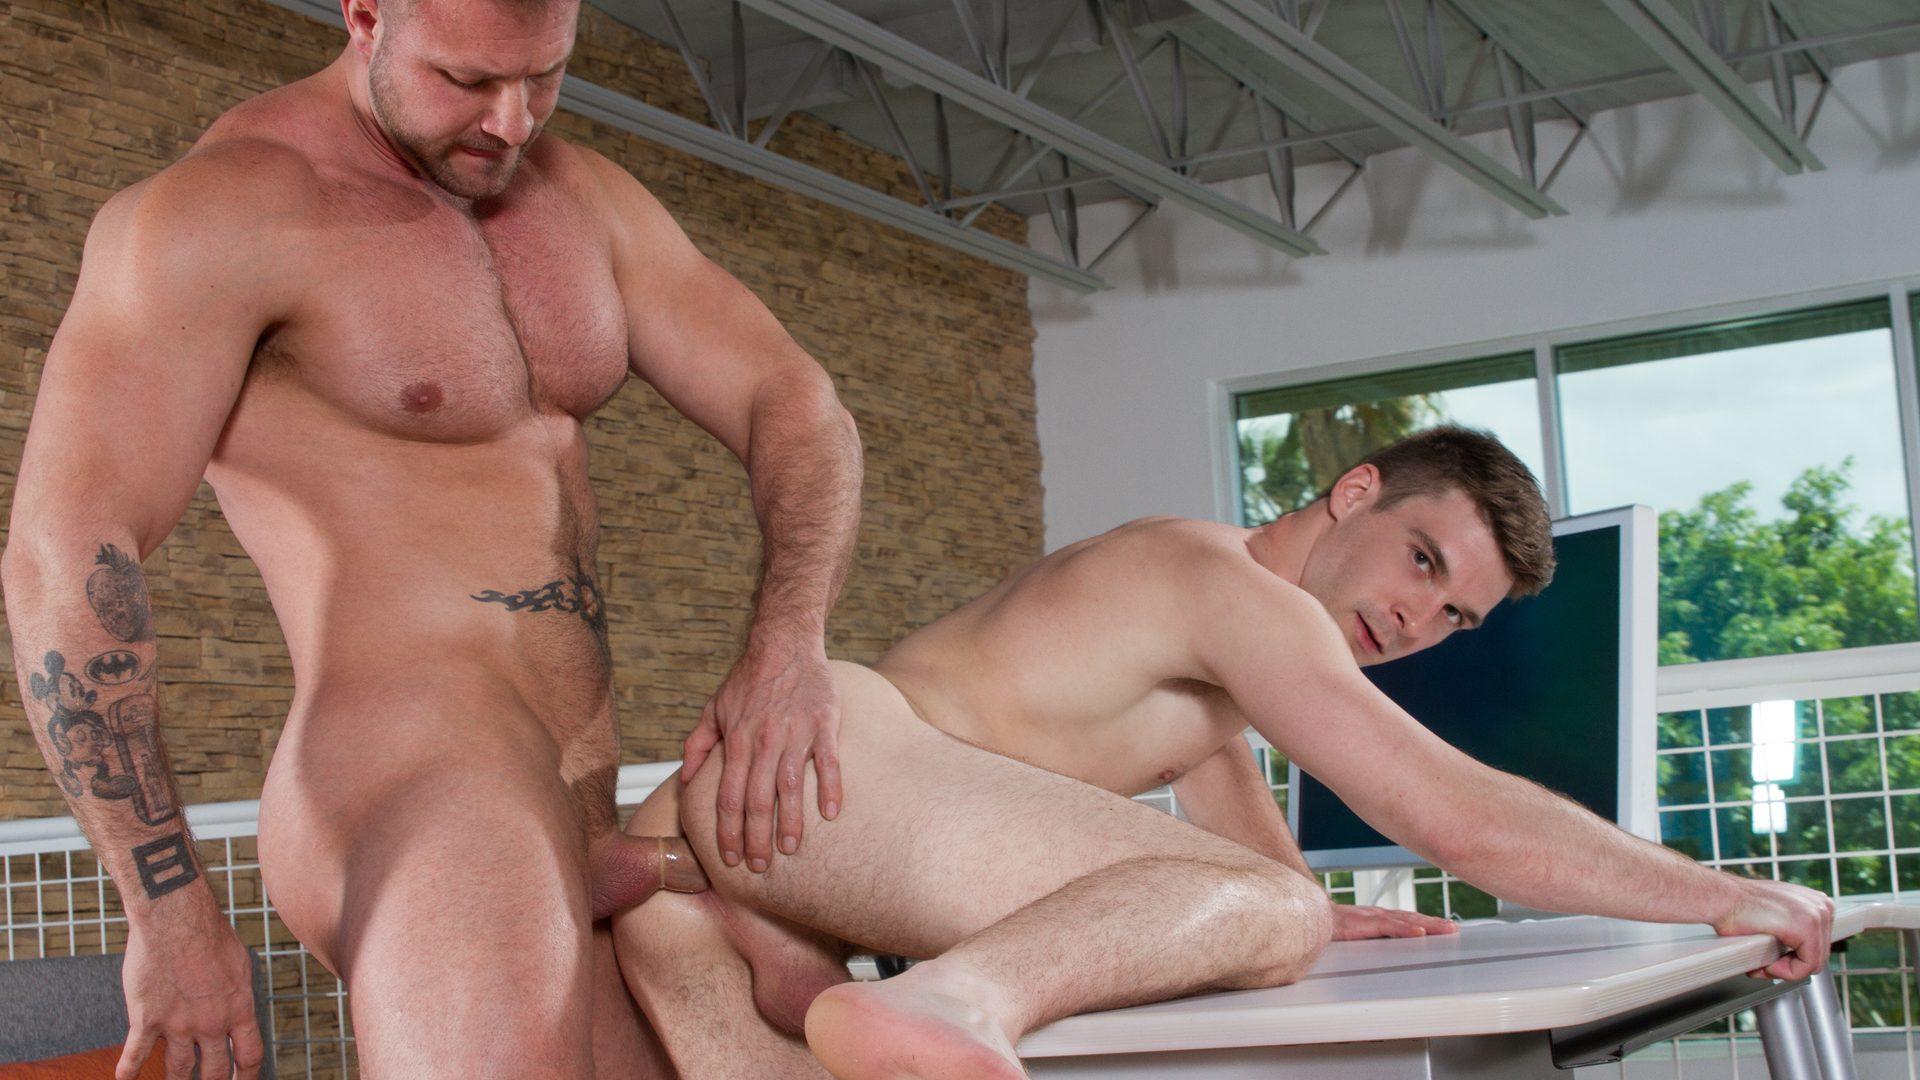 Austin Wolf and Dustin Holloway